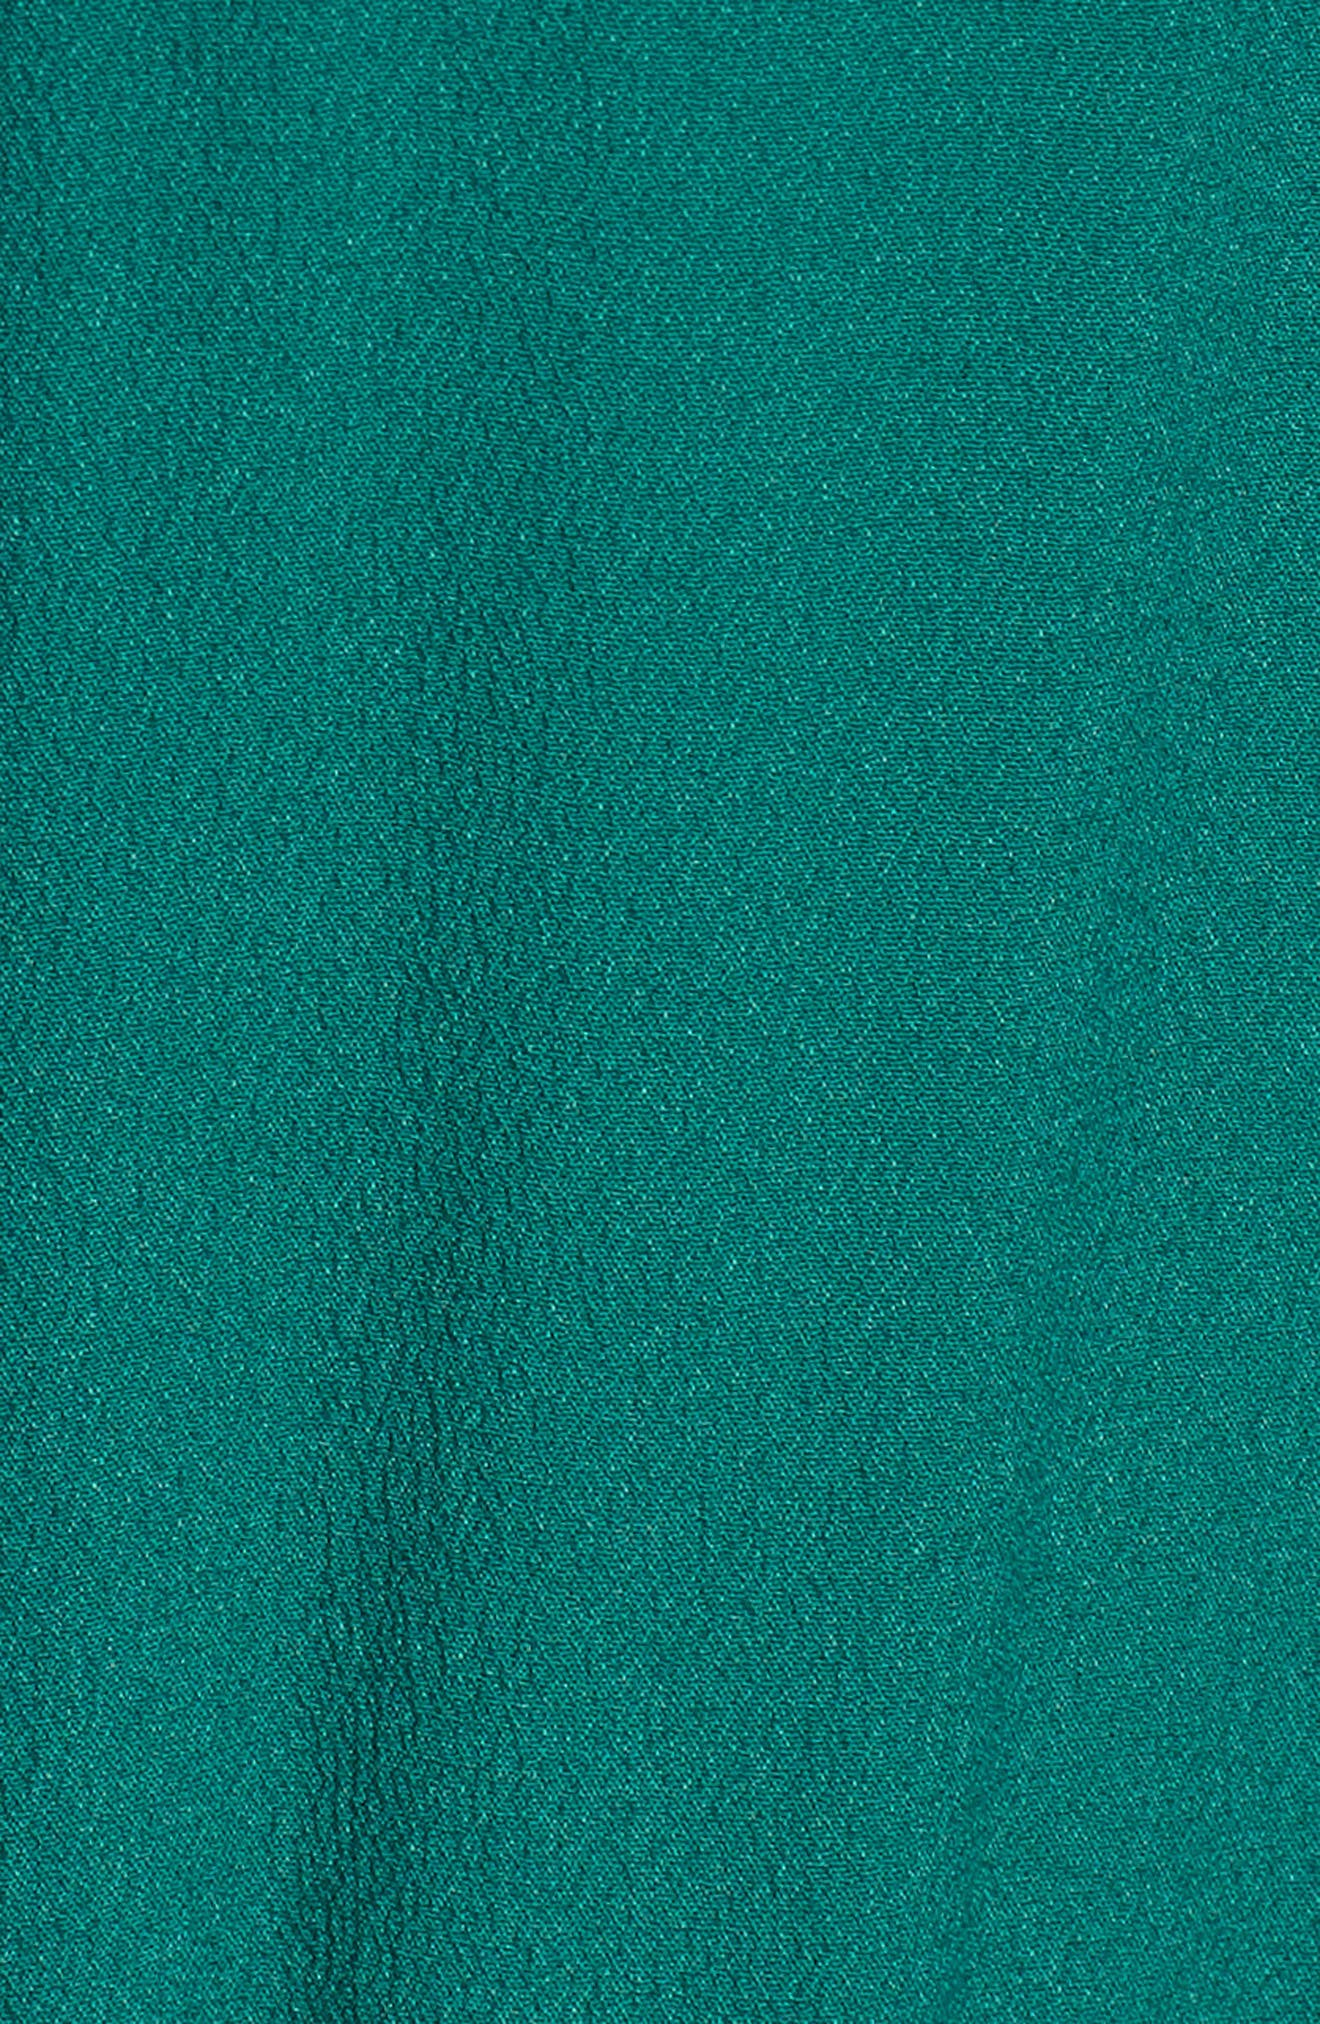 Crystal Embellished Ruffle Dress,                             Alternate thumbnail 5, color,                             300